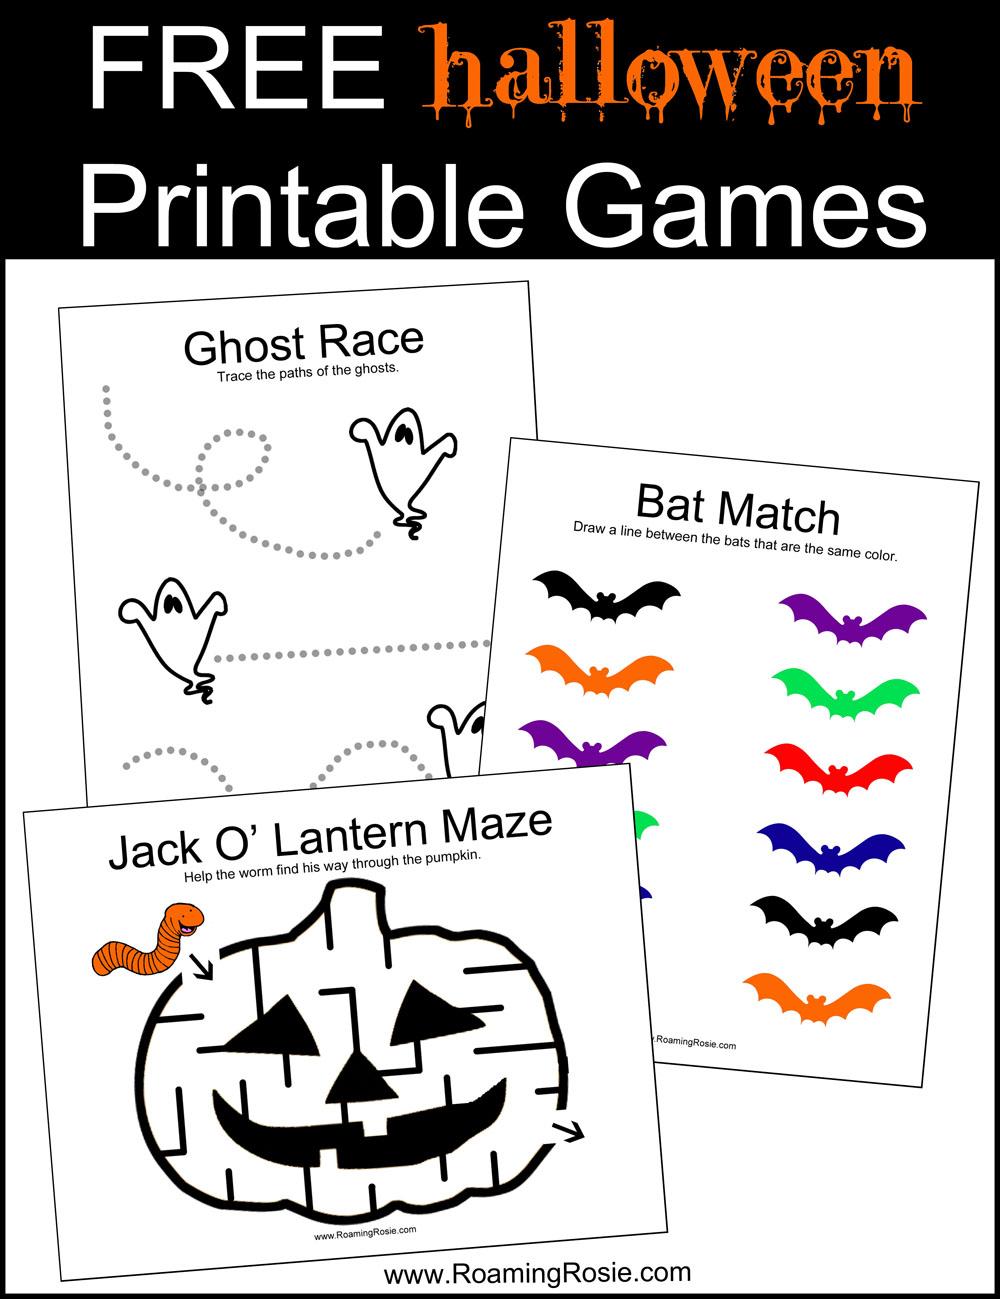 photo regarding Halloween Printable Activities identified as Totally free Halloween Printable Video games Roaming Rosie